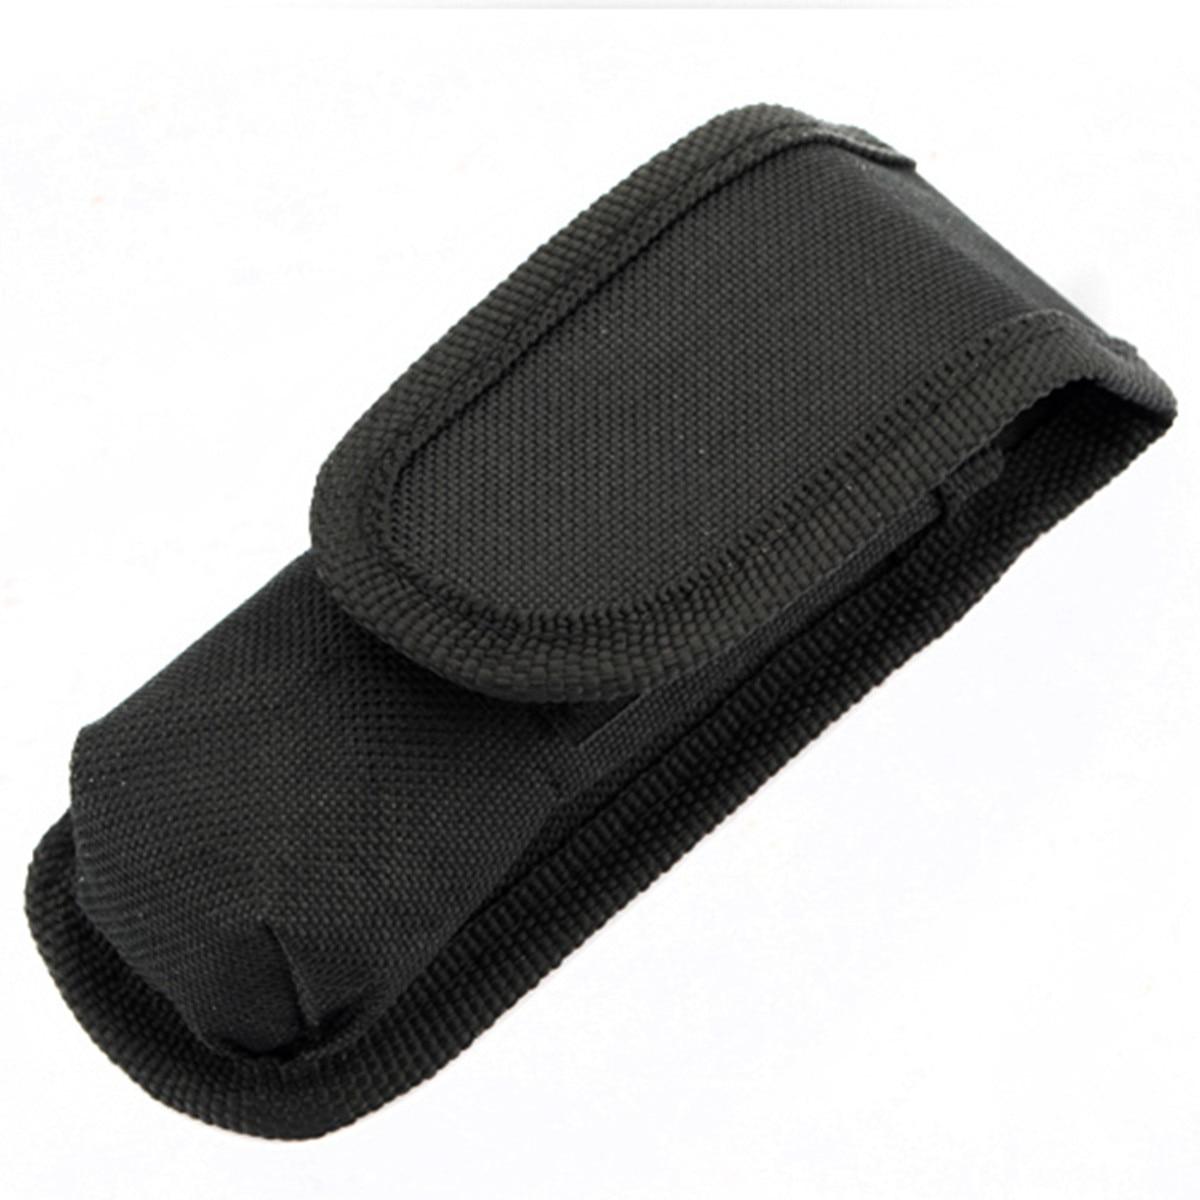 High quality Black Nylon magic sticker Flashlight Holster Pouch Torch Cover Case Belt Bag Folded size 12.5X4.7X3.5cm